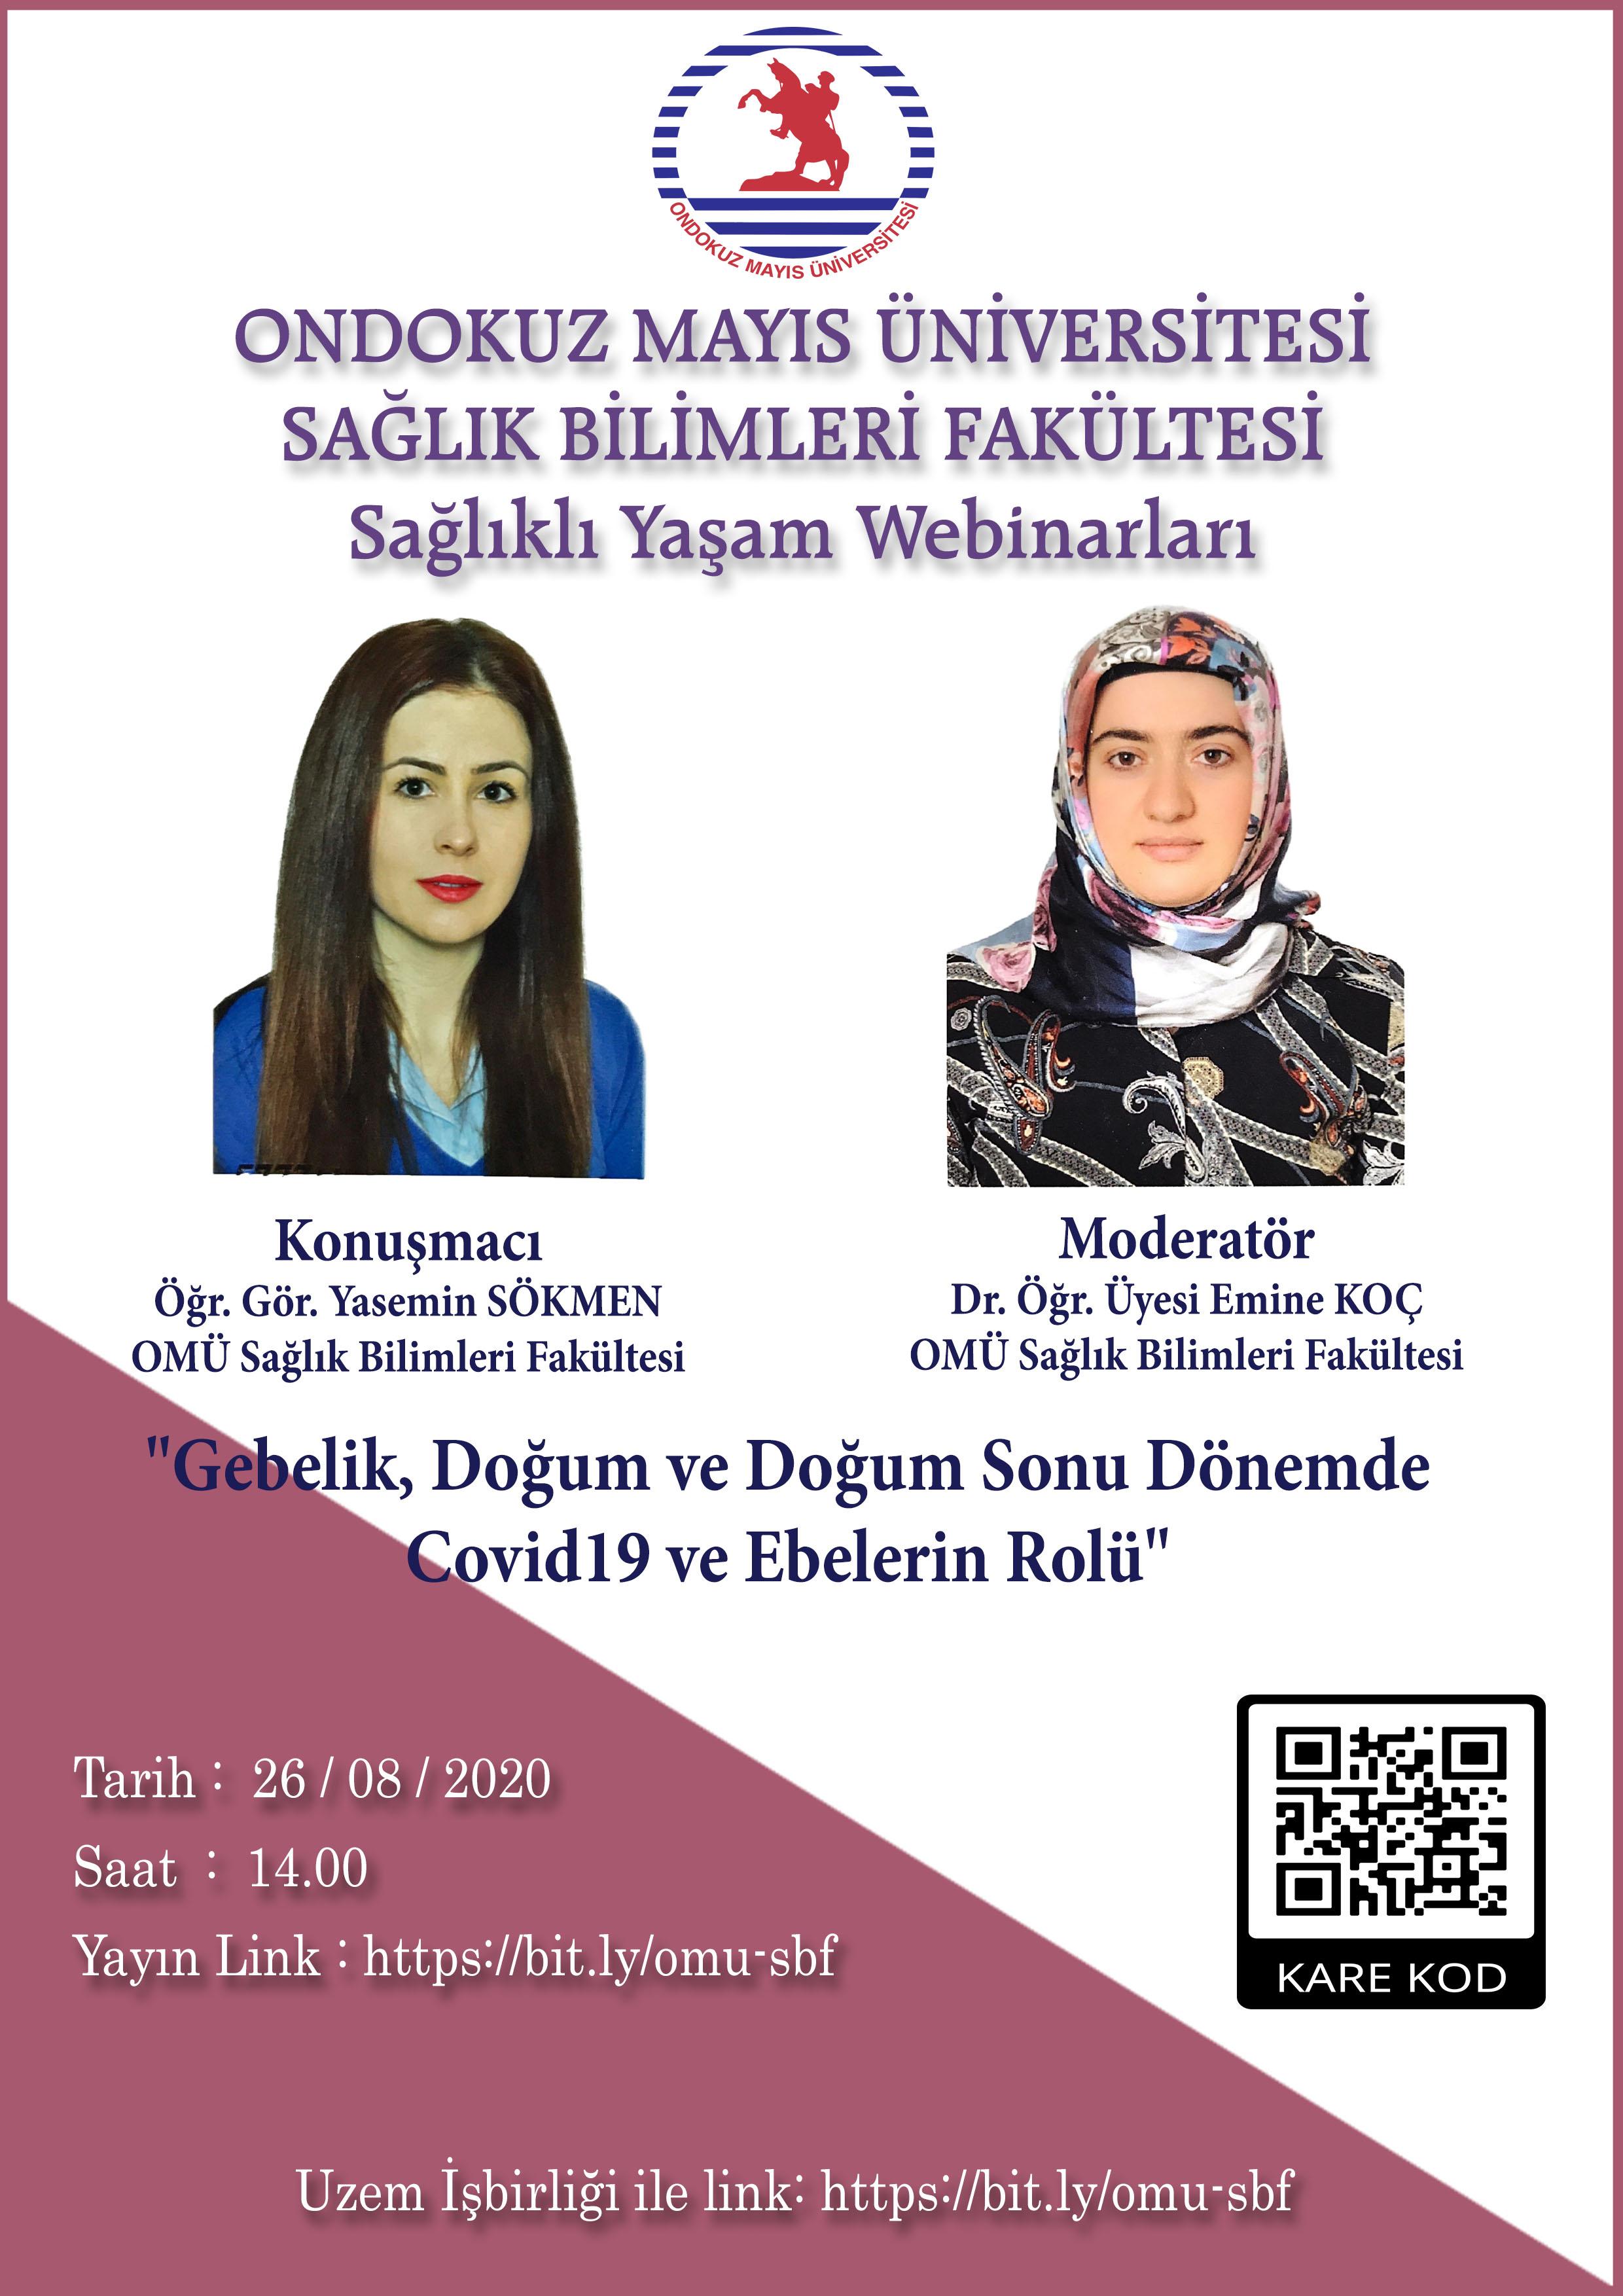 https://www.omu.edu.tr/sites/default/files/saglikli_yasam_webinarlari_-_8.jpg